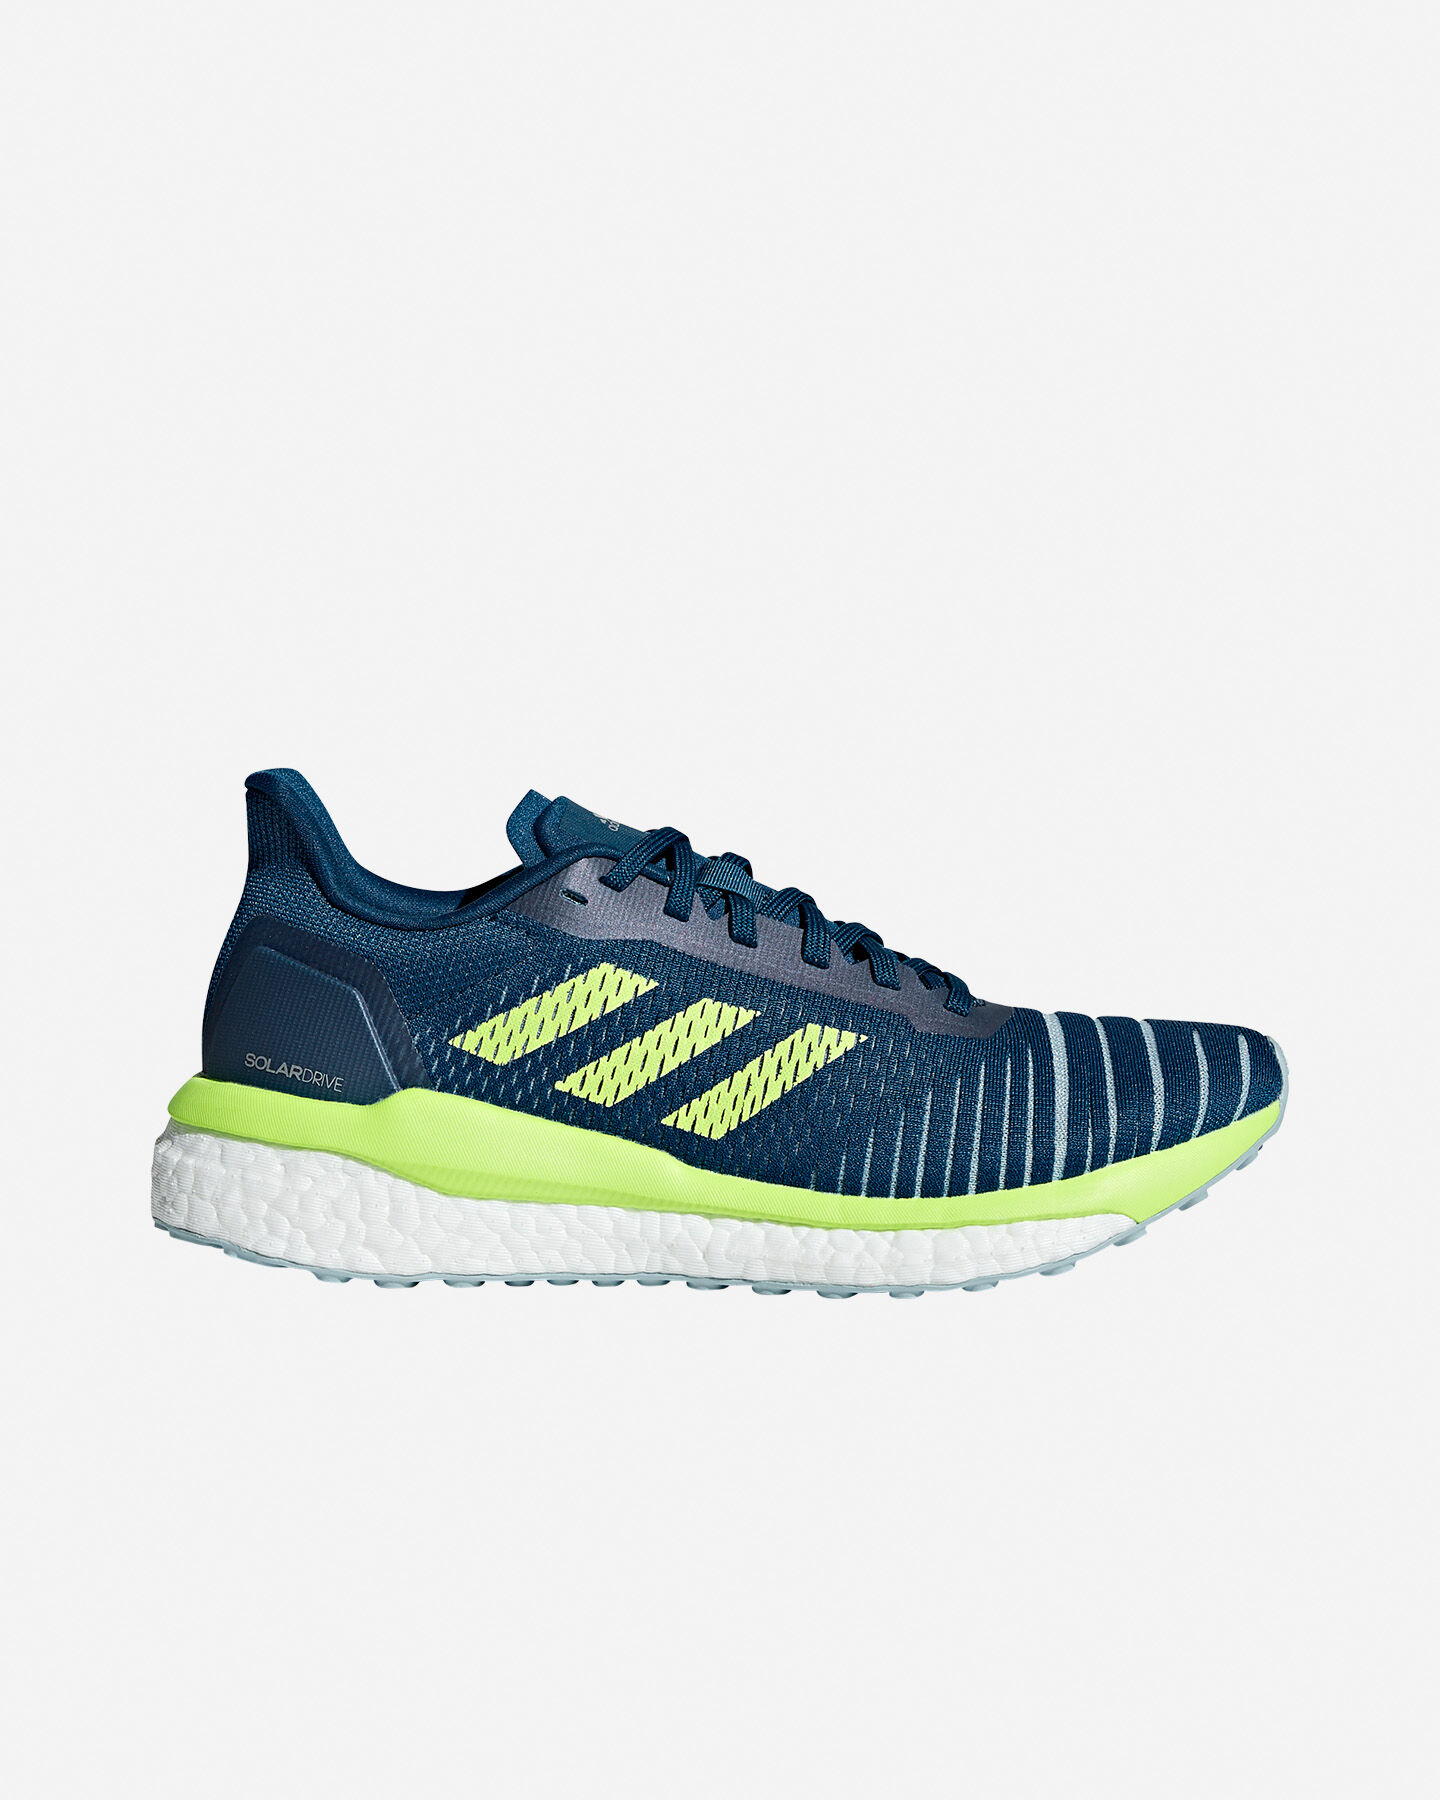 Scarpe Running Adidas Solar Drive 19 W EF0777 | Cisalfa Sport